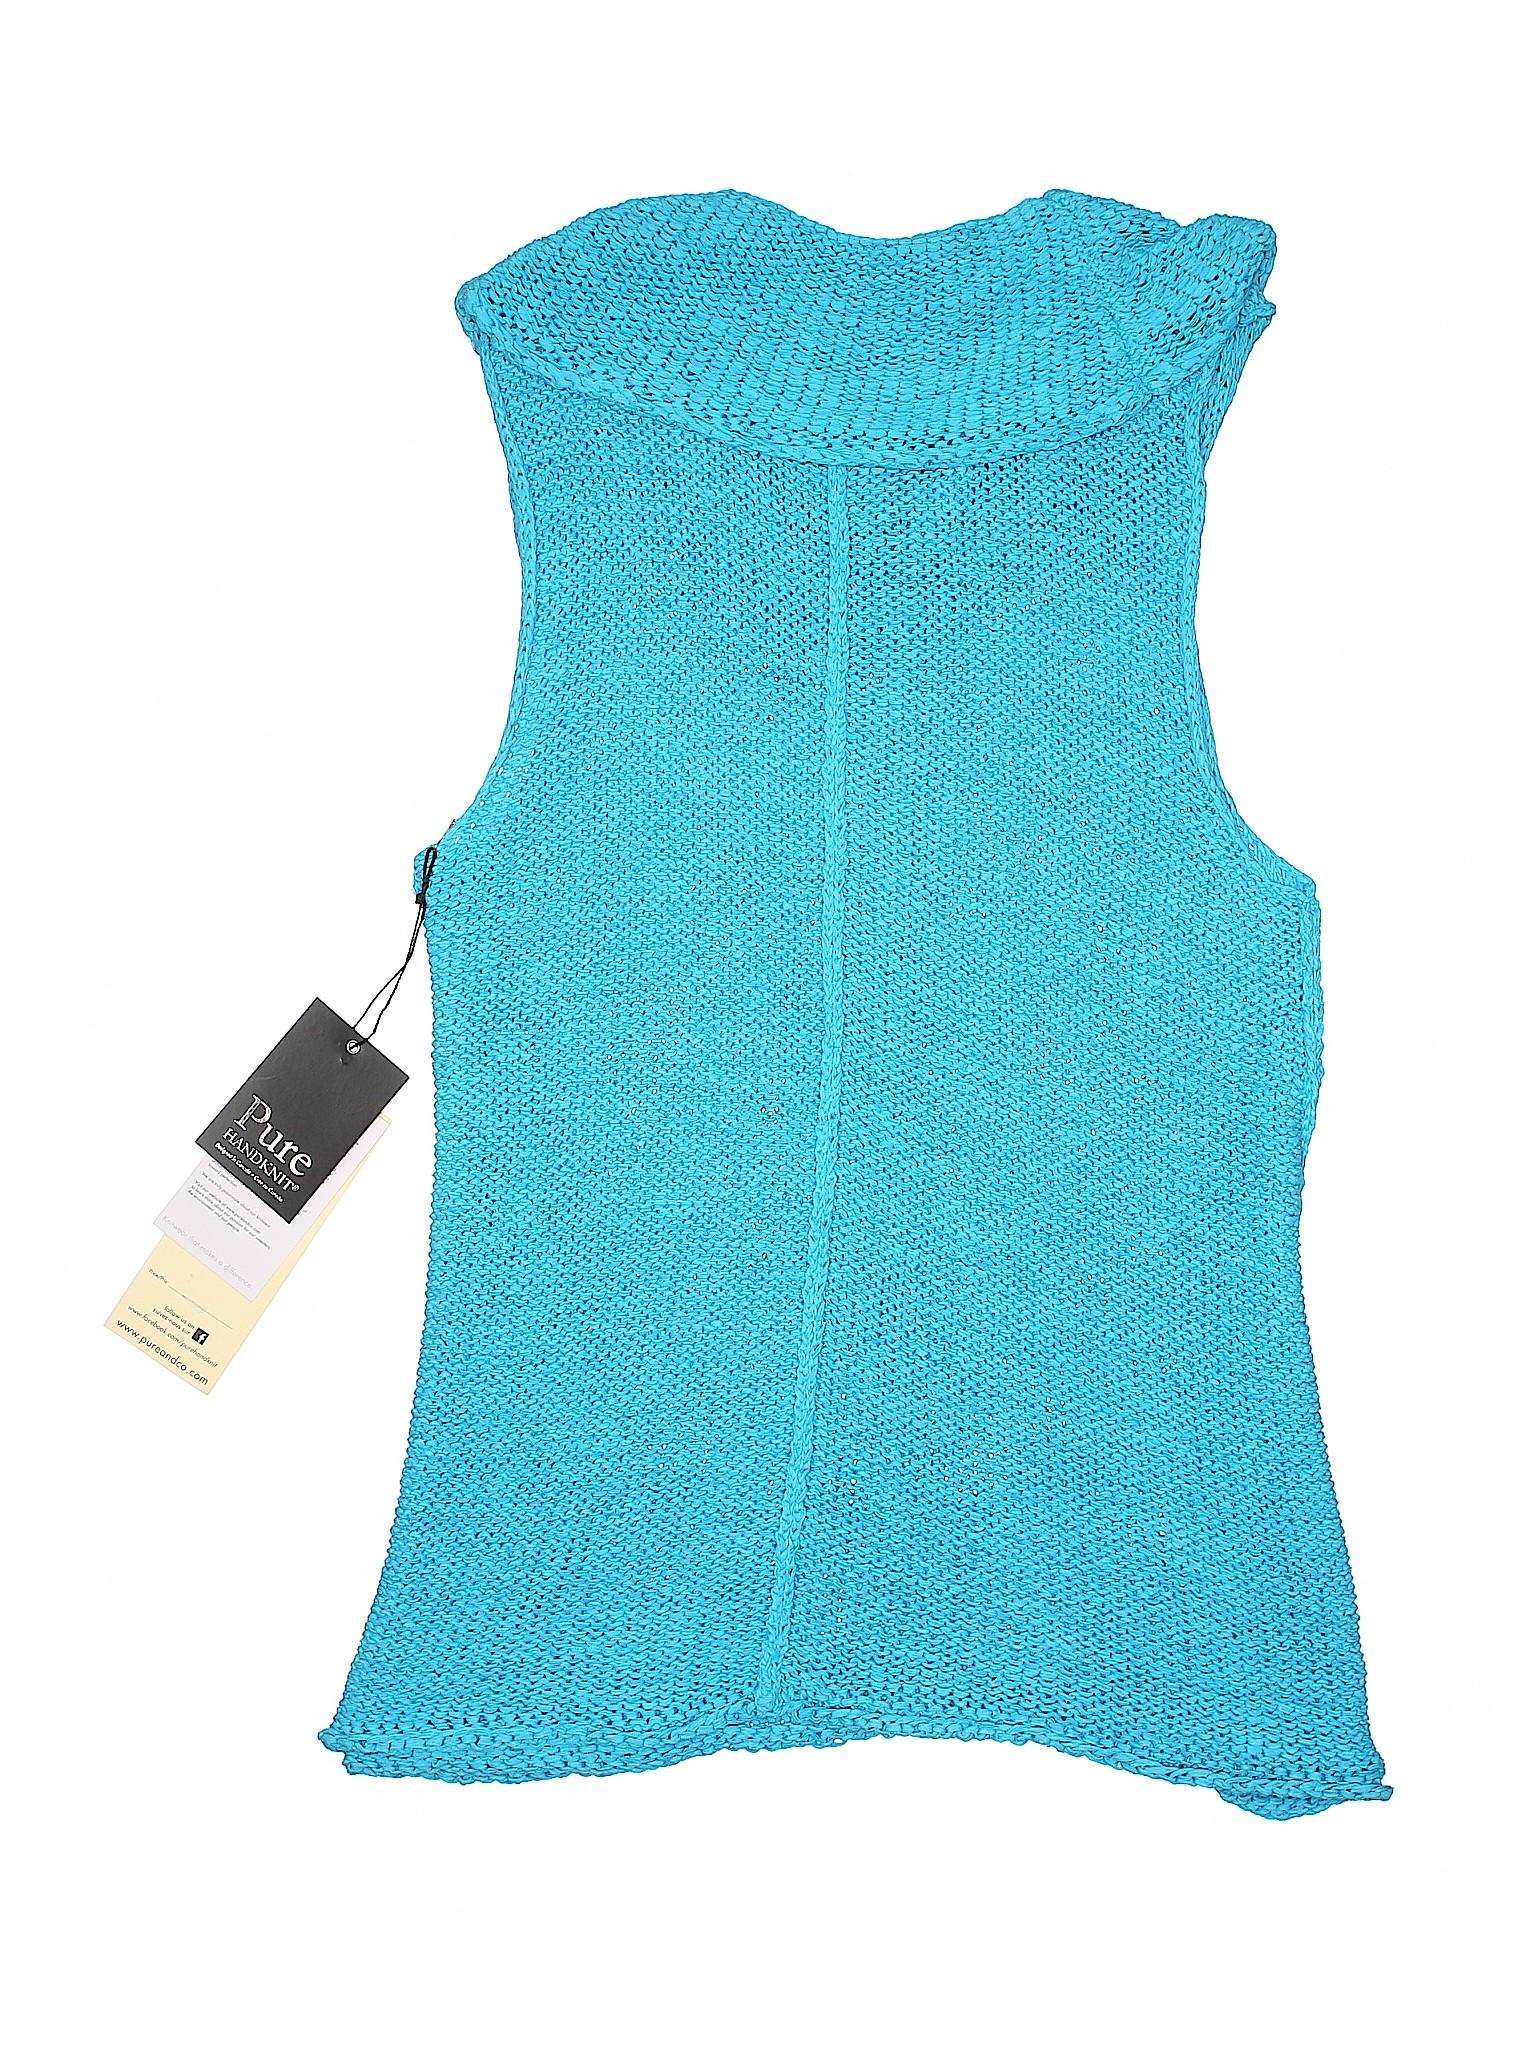 Pullover PURE PURE HANDKNIT Boutique Sweater HANDKNIT Boutique Pullover wErE7